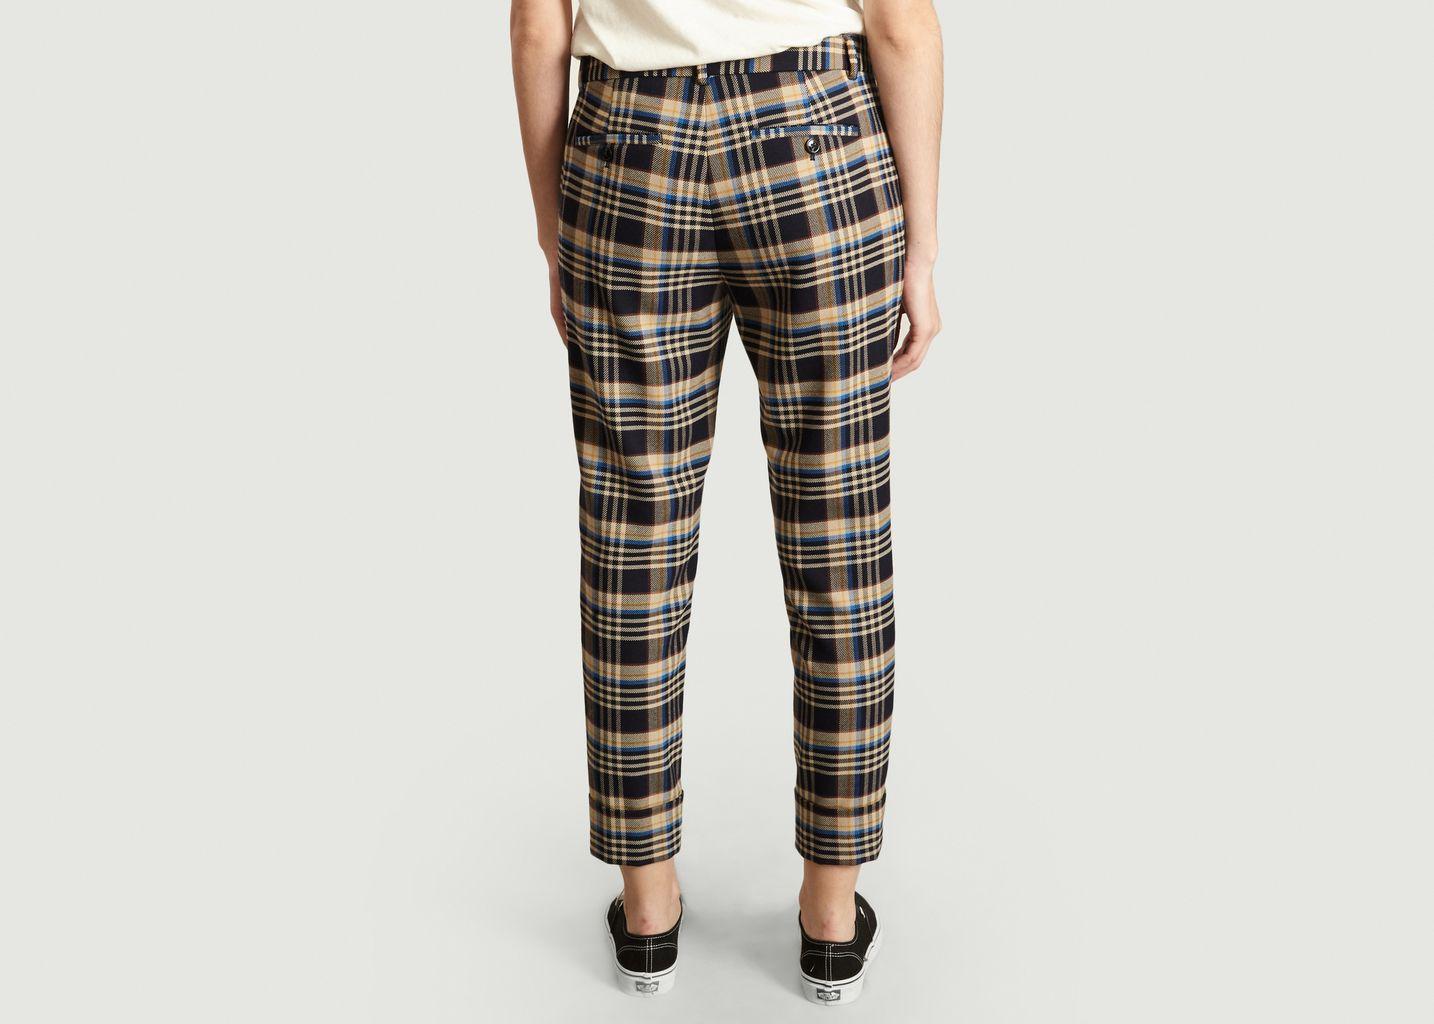 Pantalon A Carreaux 7/8e Stewart - Closed